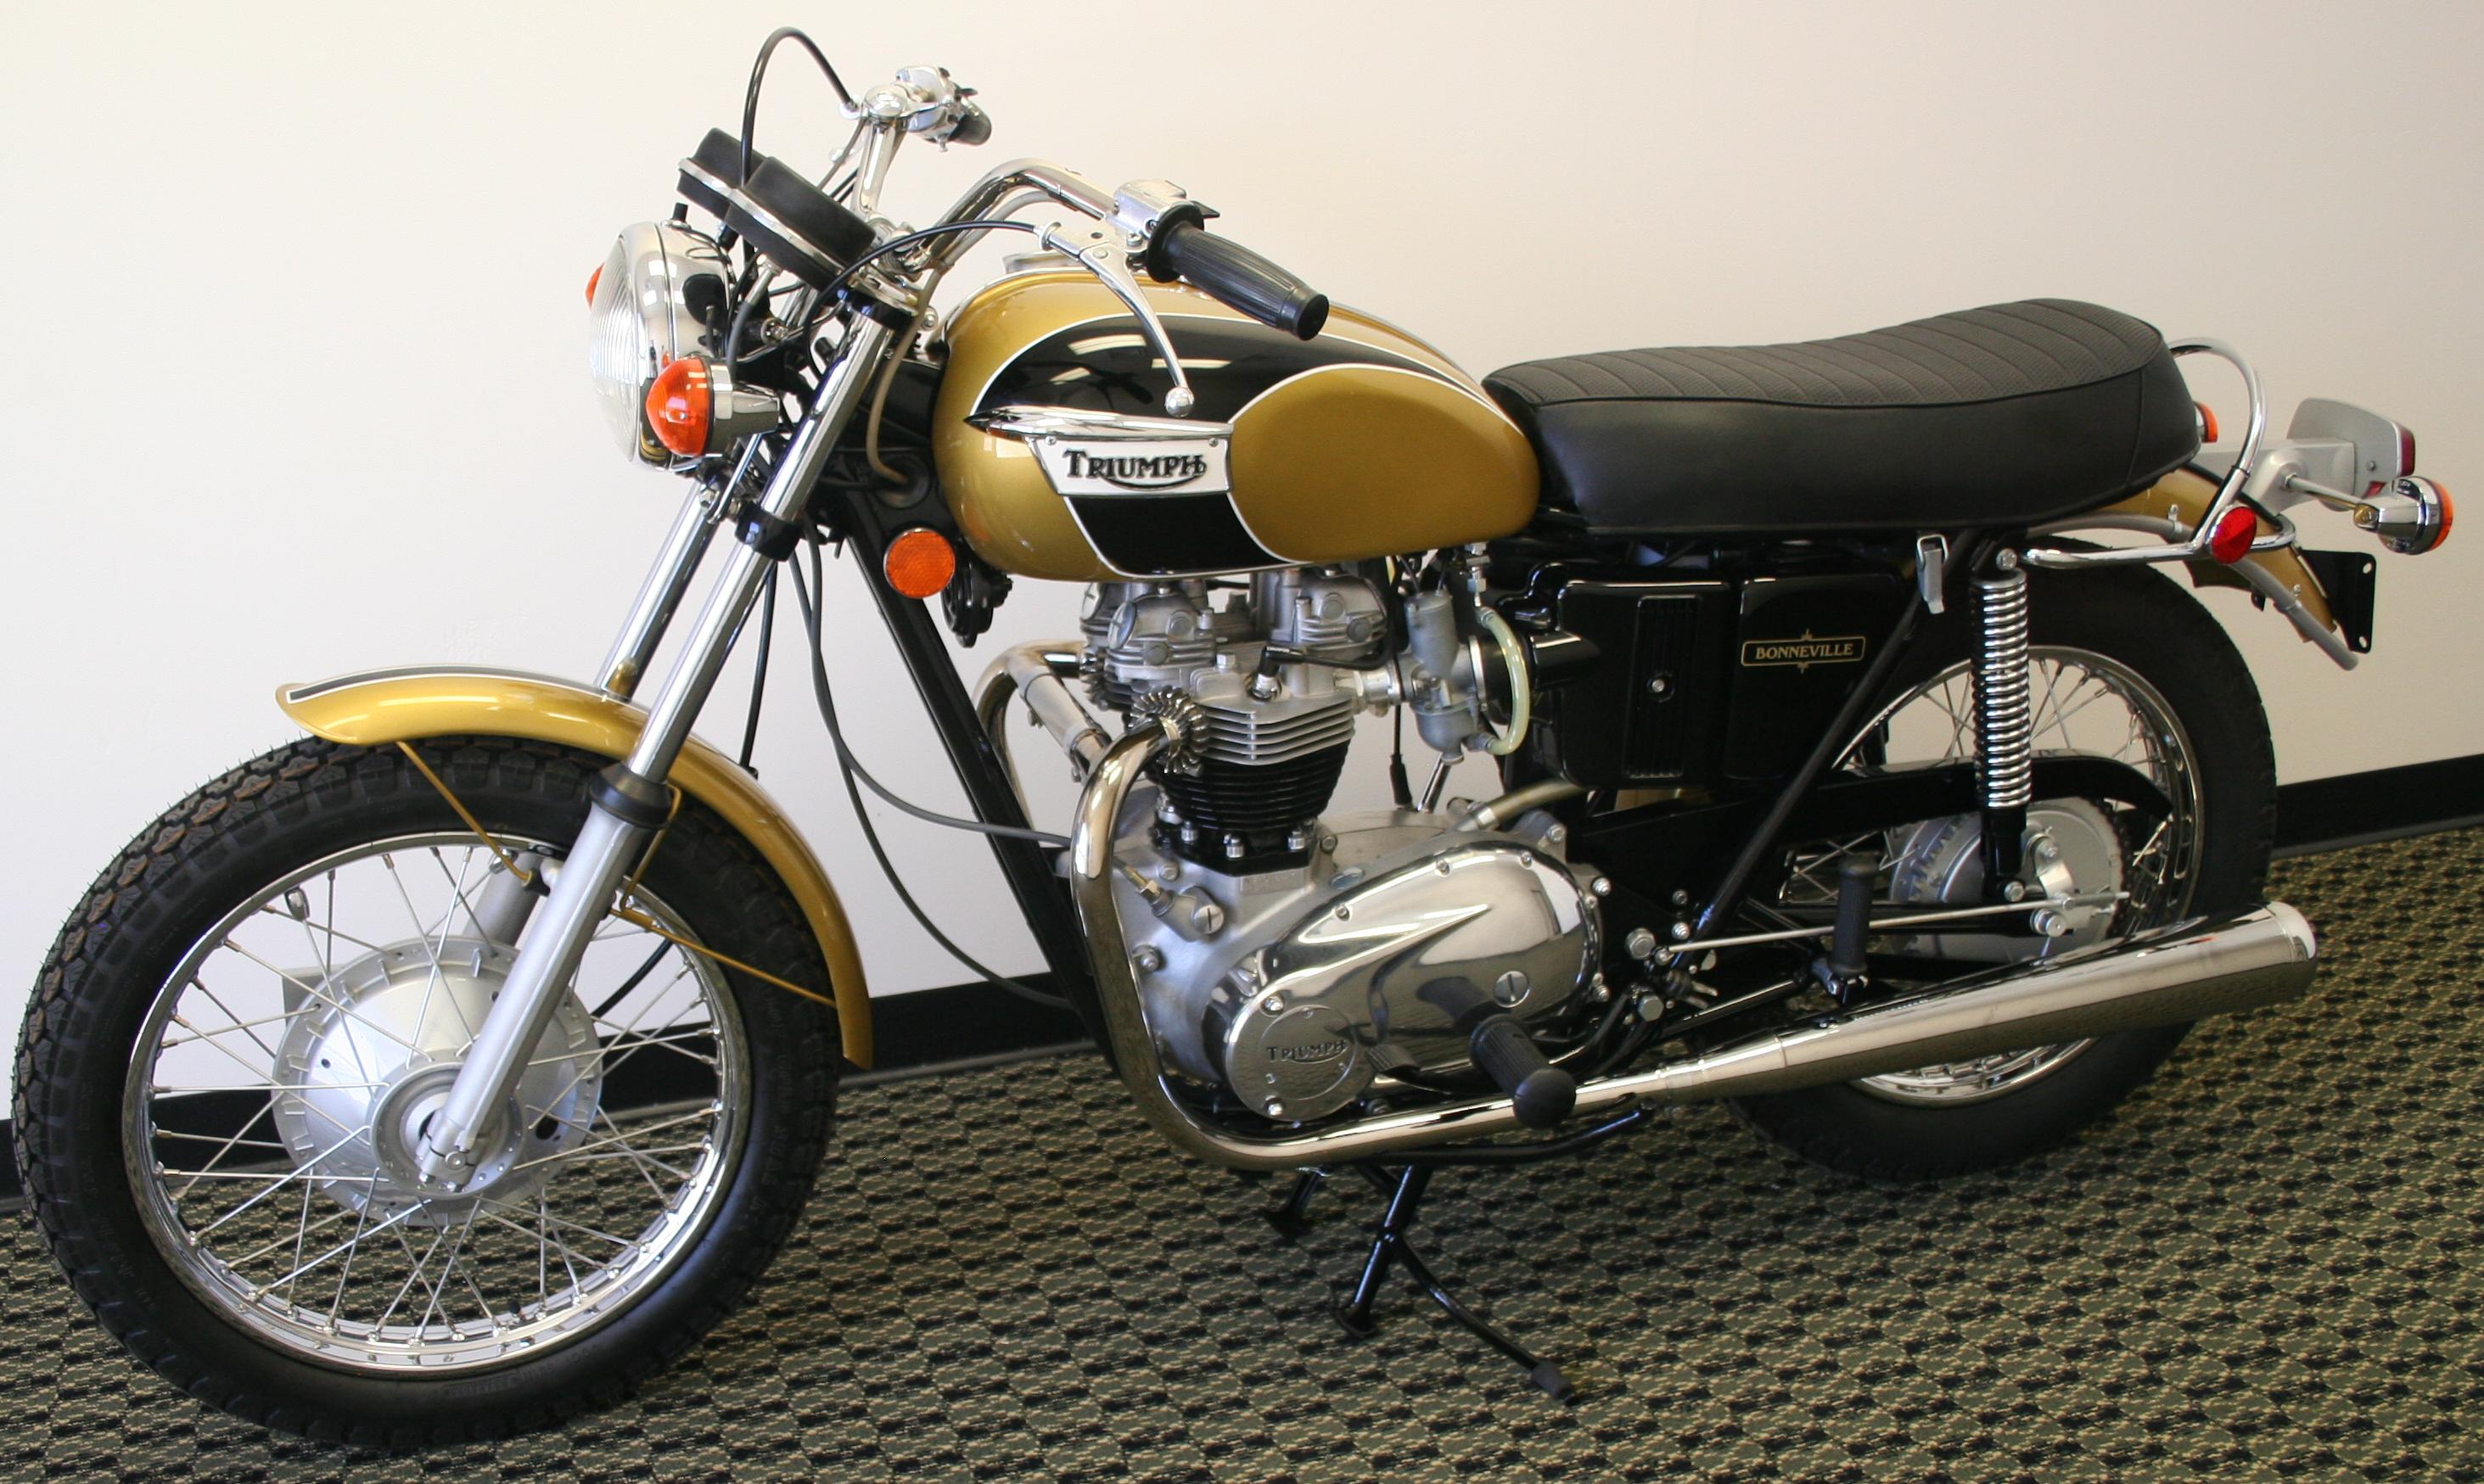 1970 Bonneville Triumph Ide Dimage De Moto Wiring Harness For 1971 Motorcycle Waynes Motorcycles